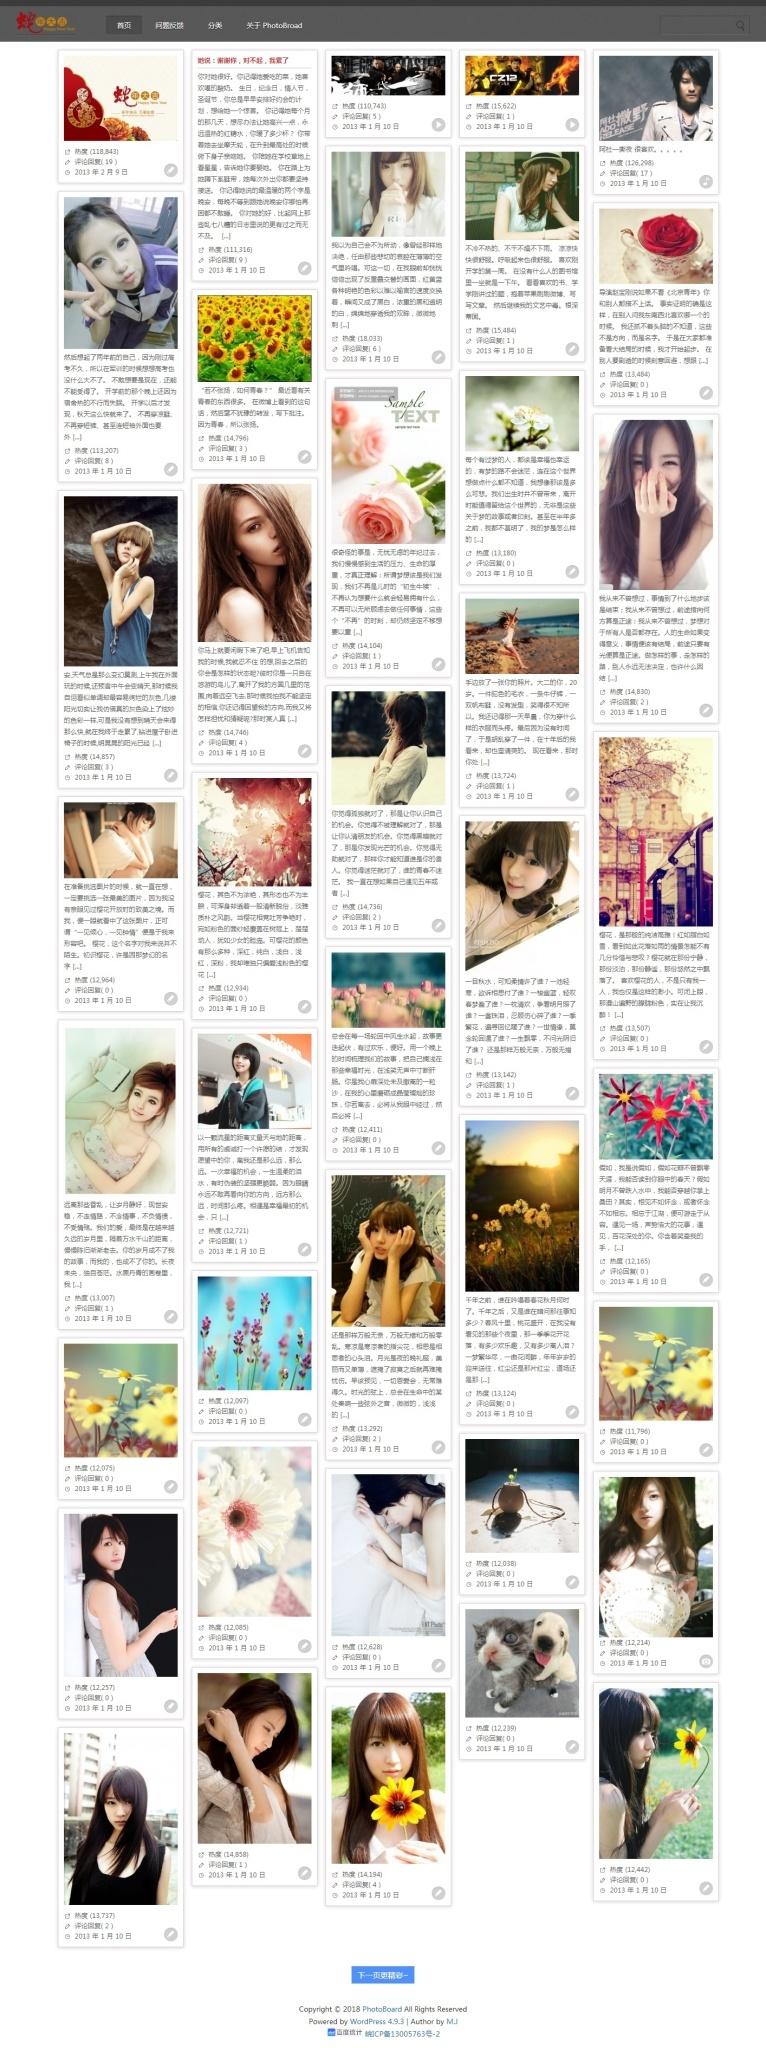 wordpress瀑布流图片主题PhotoBroad模板2.0